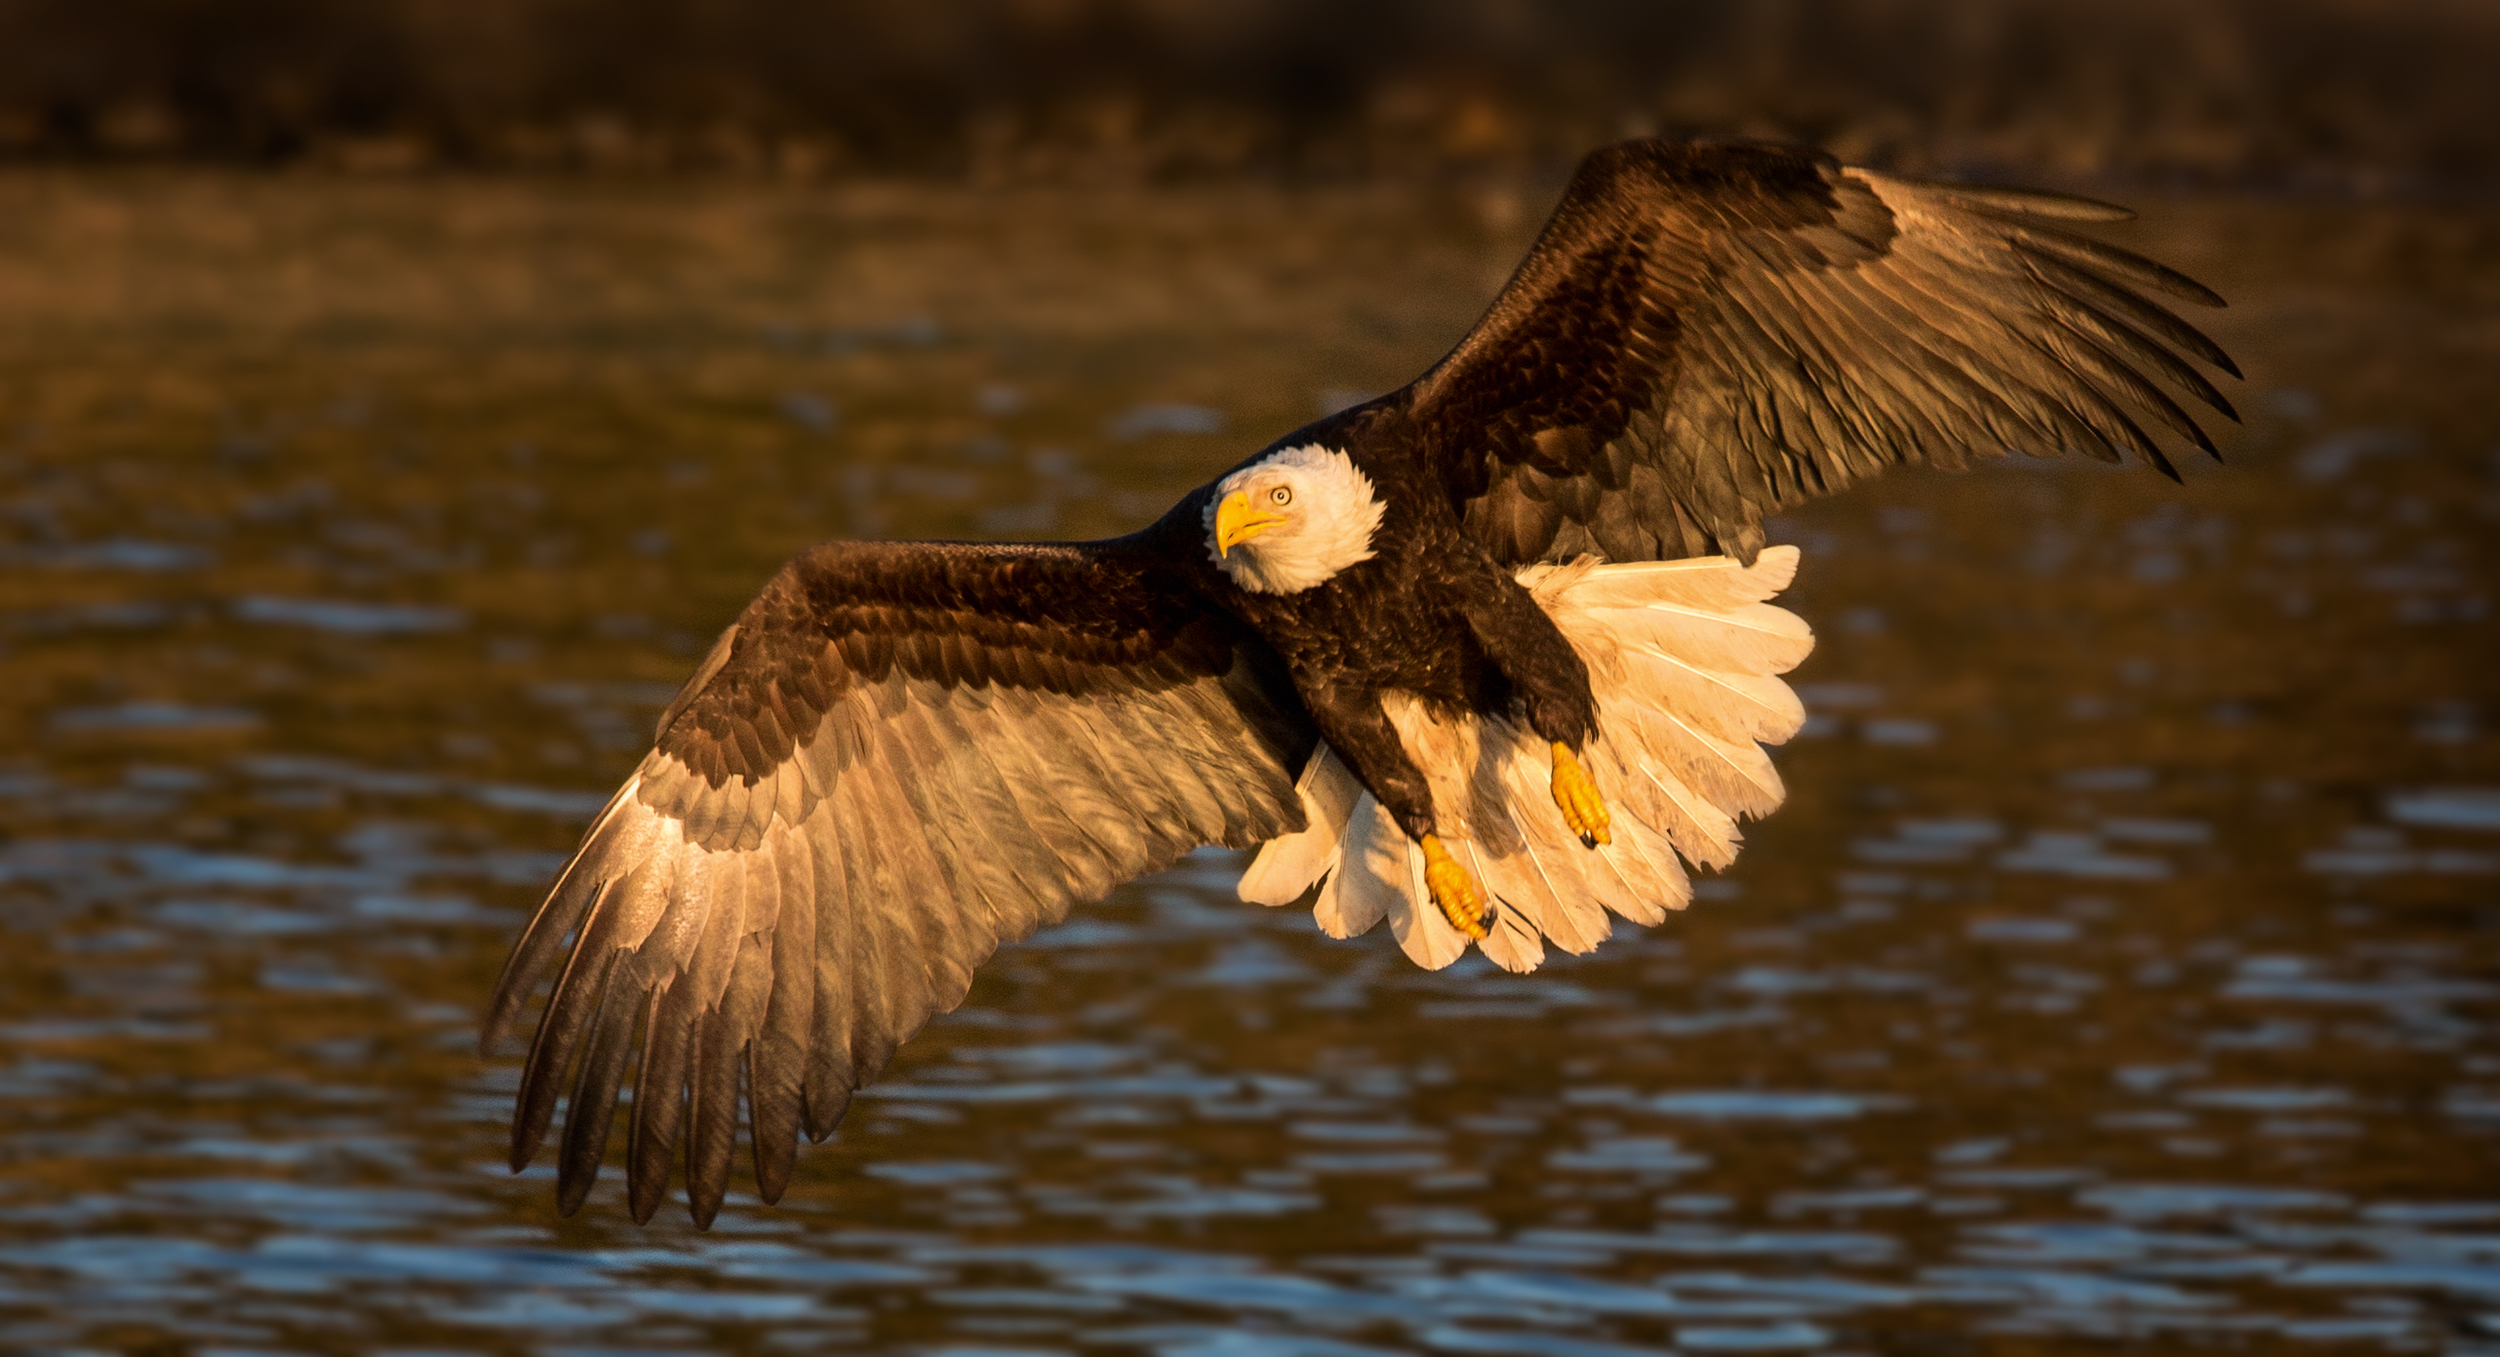 Rick Sammon's Birds030.jpg